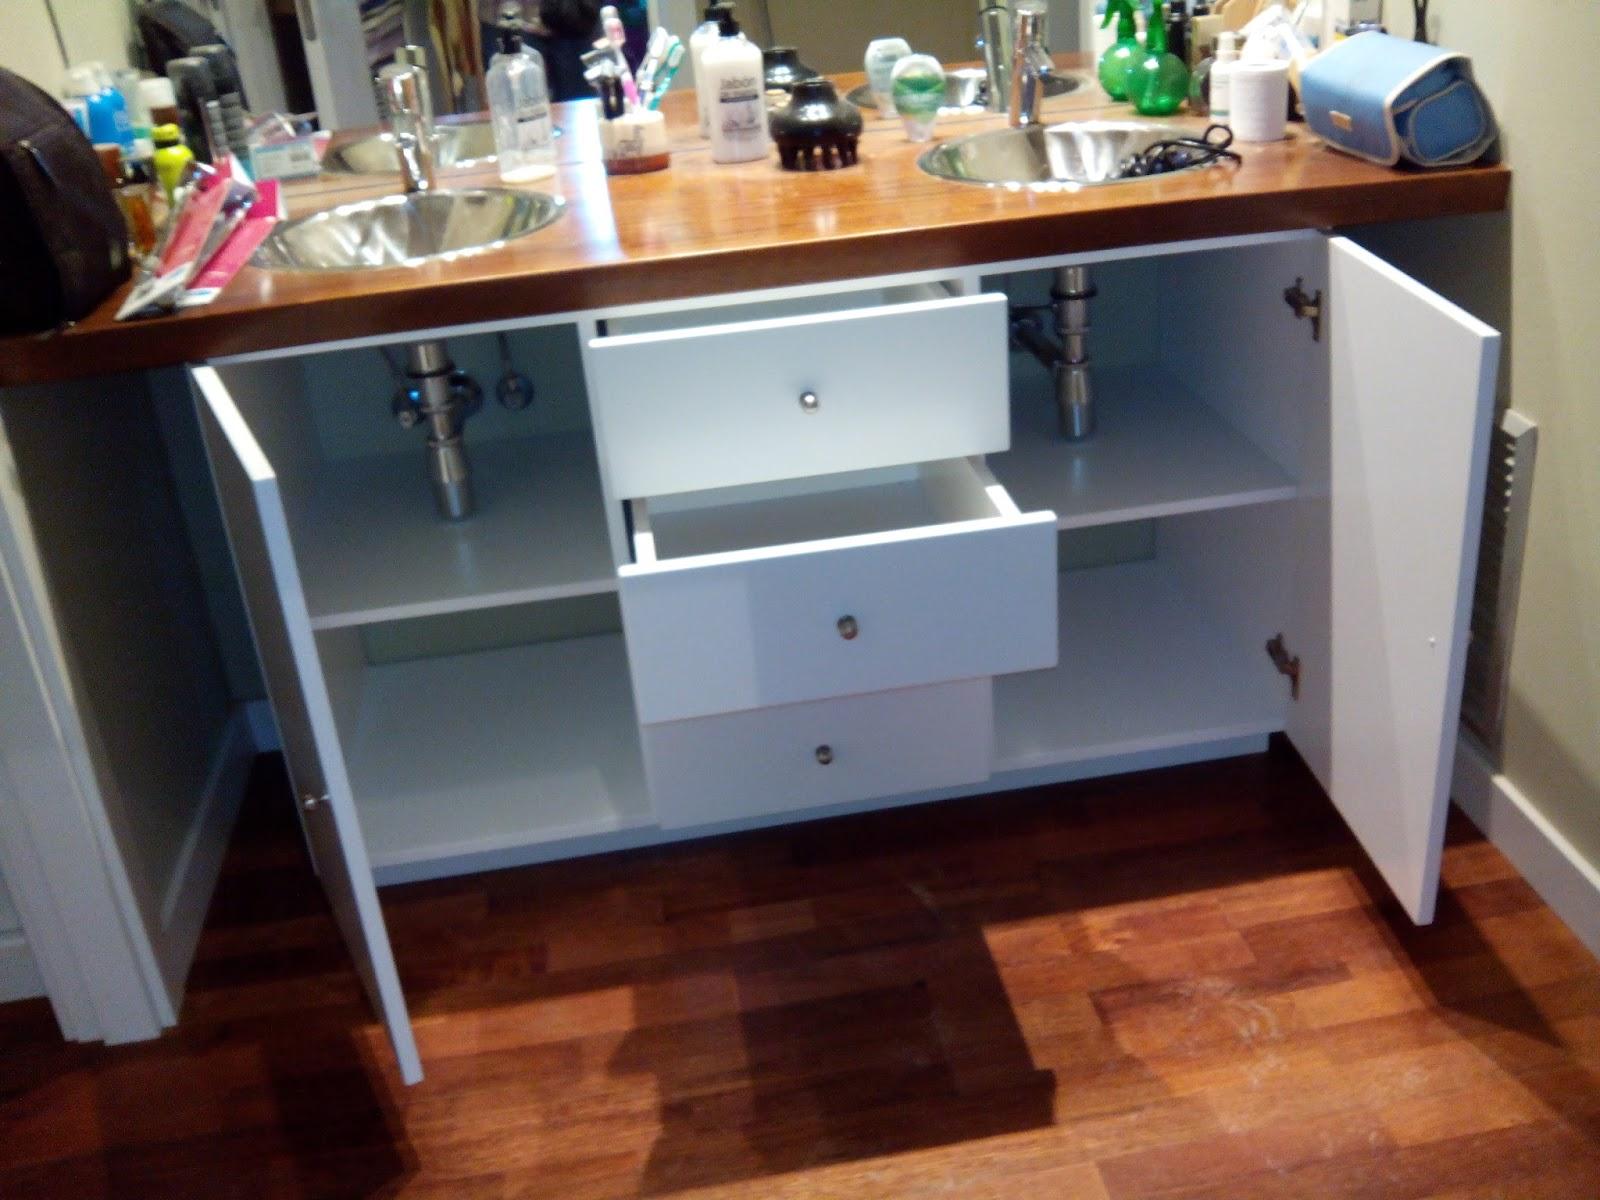 Mueble de cuarto de ba o para dos lavabos muebles cansado zaragoza carpintero ebanista - Muebles a medida en zaragoza ...